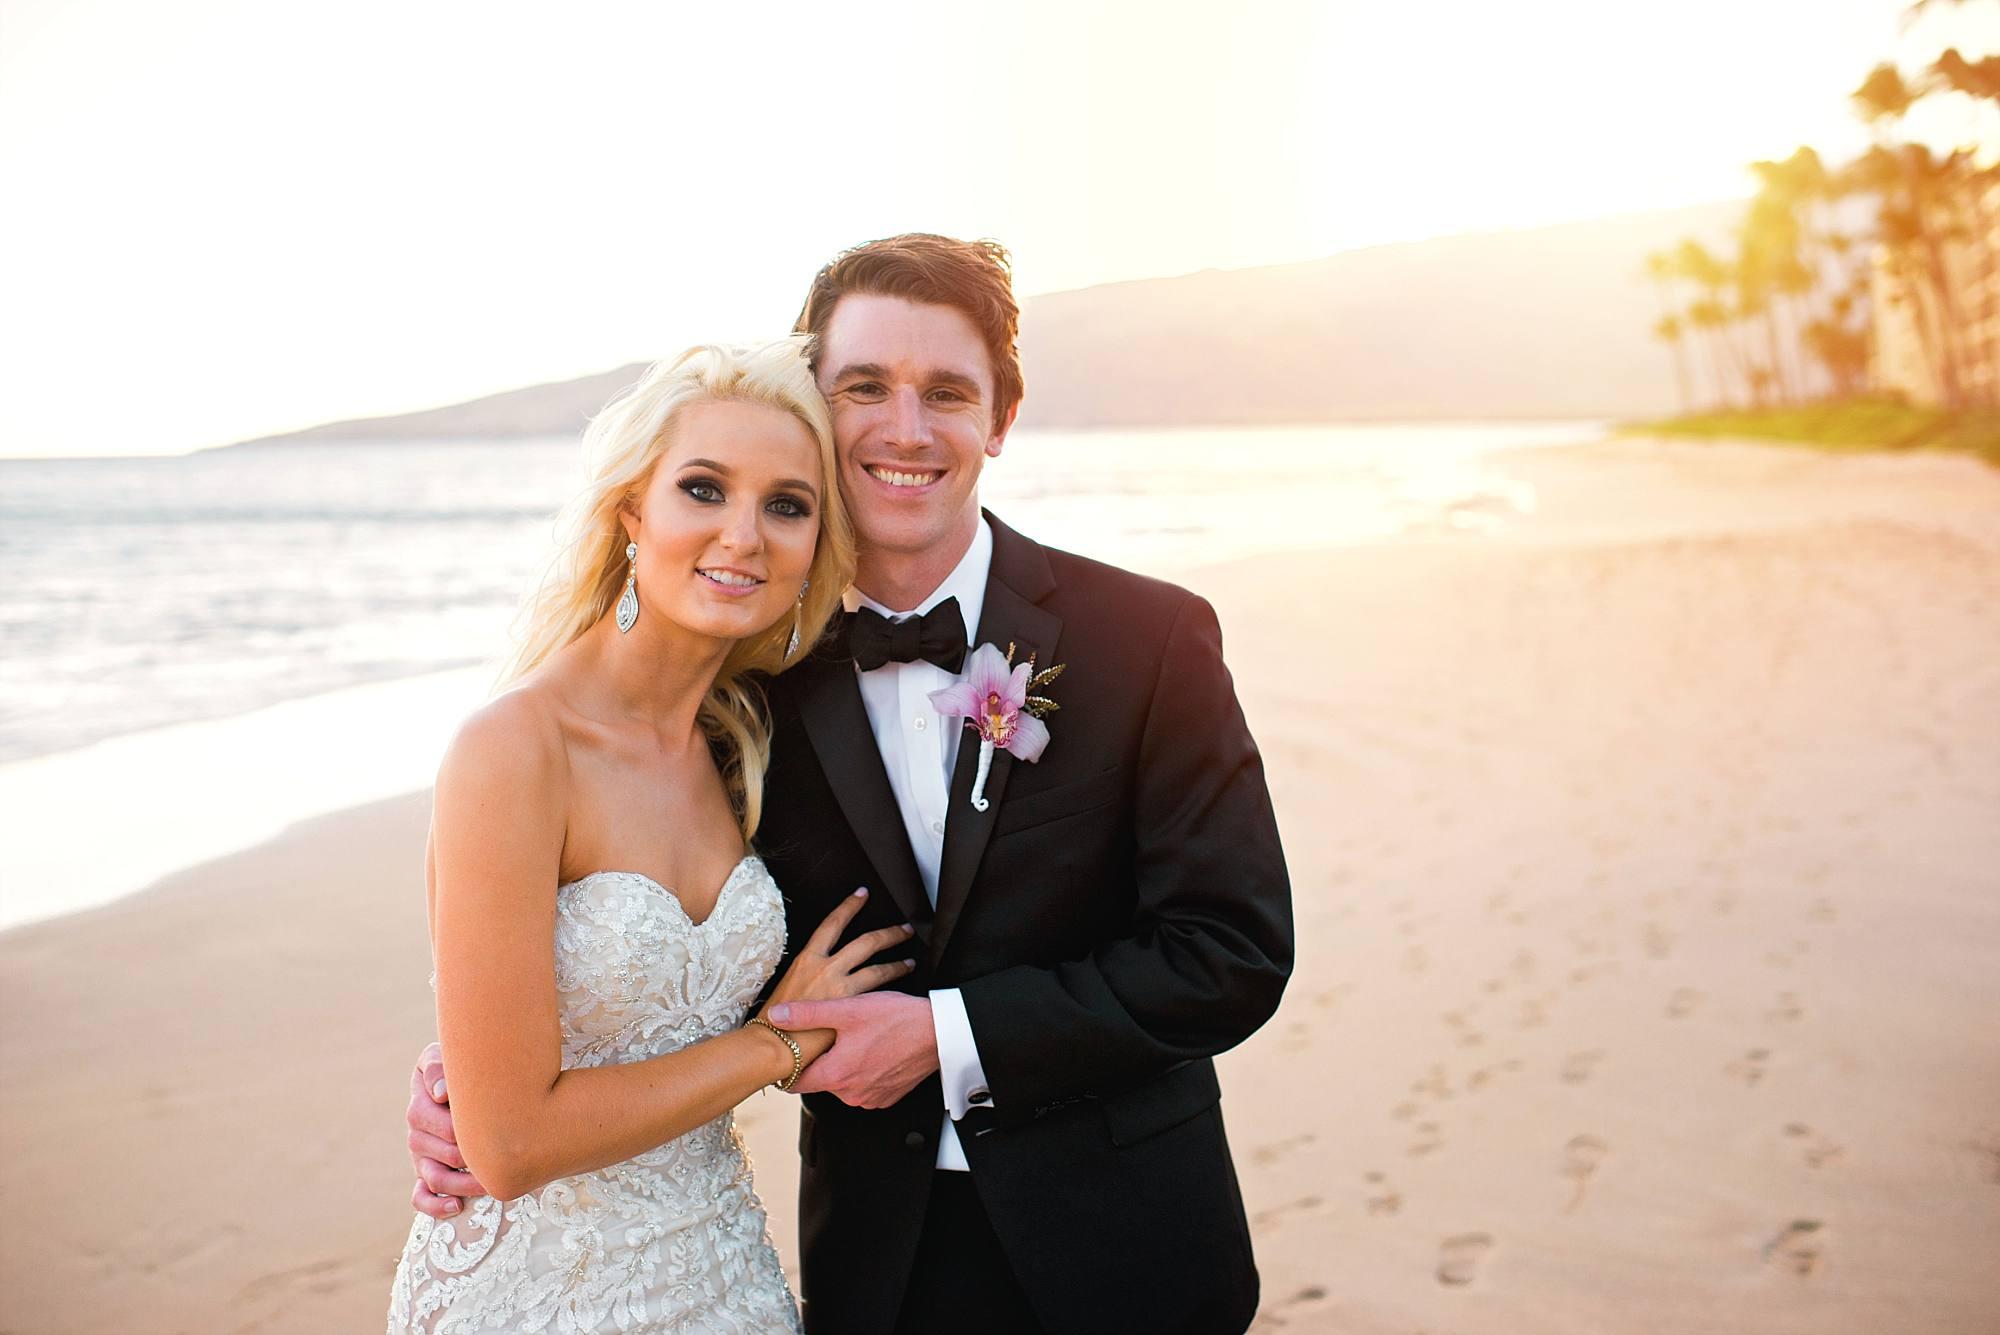 wedding bride and groom photoshoot on beach at beginning of sunset